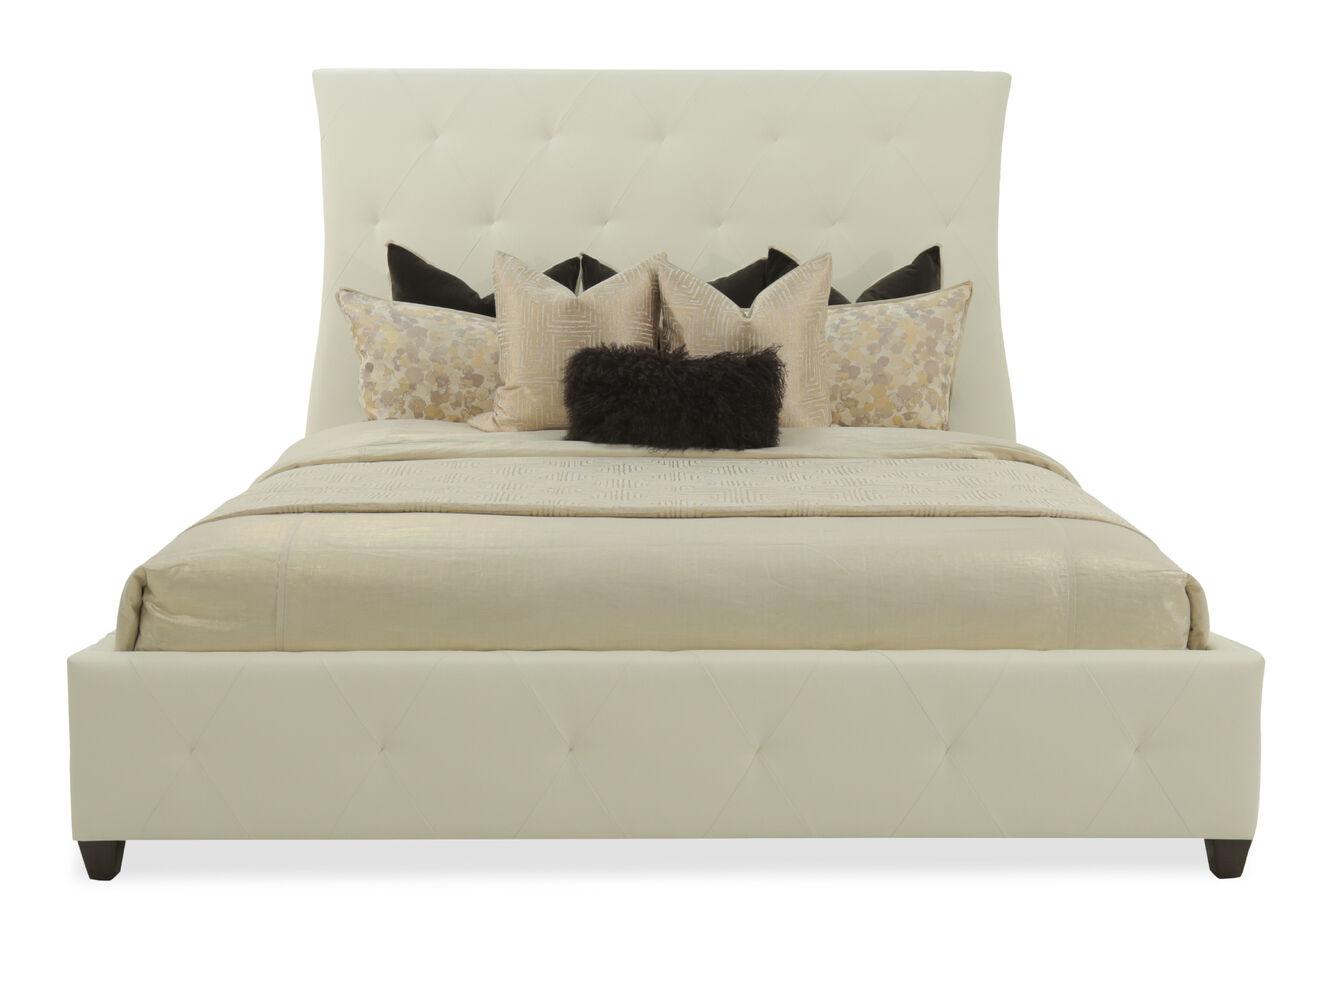 Bernhardt Jet Set Leather Bed